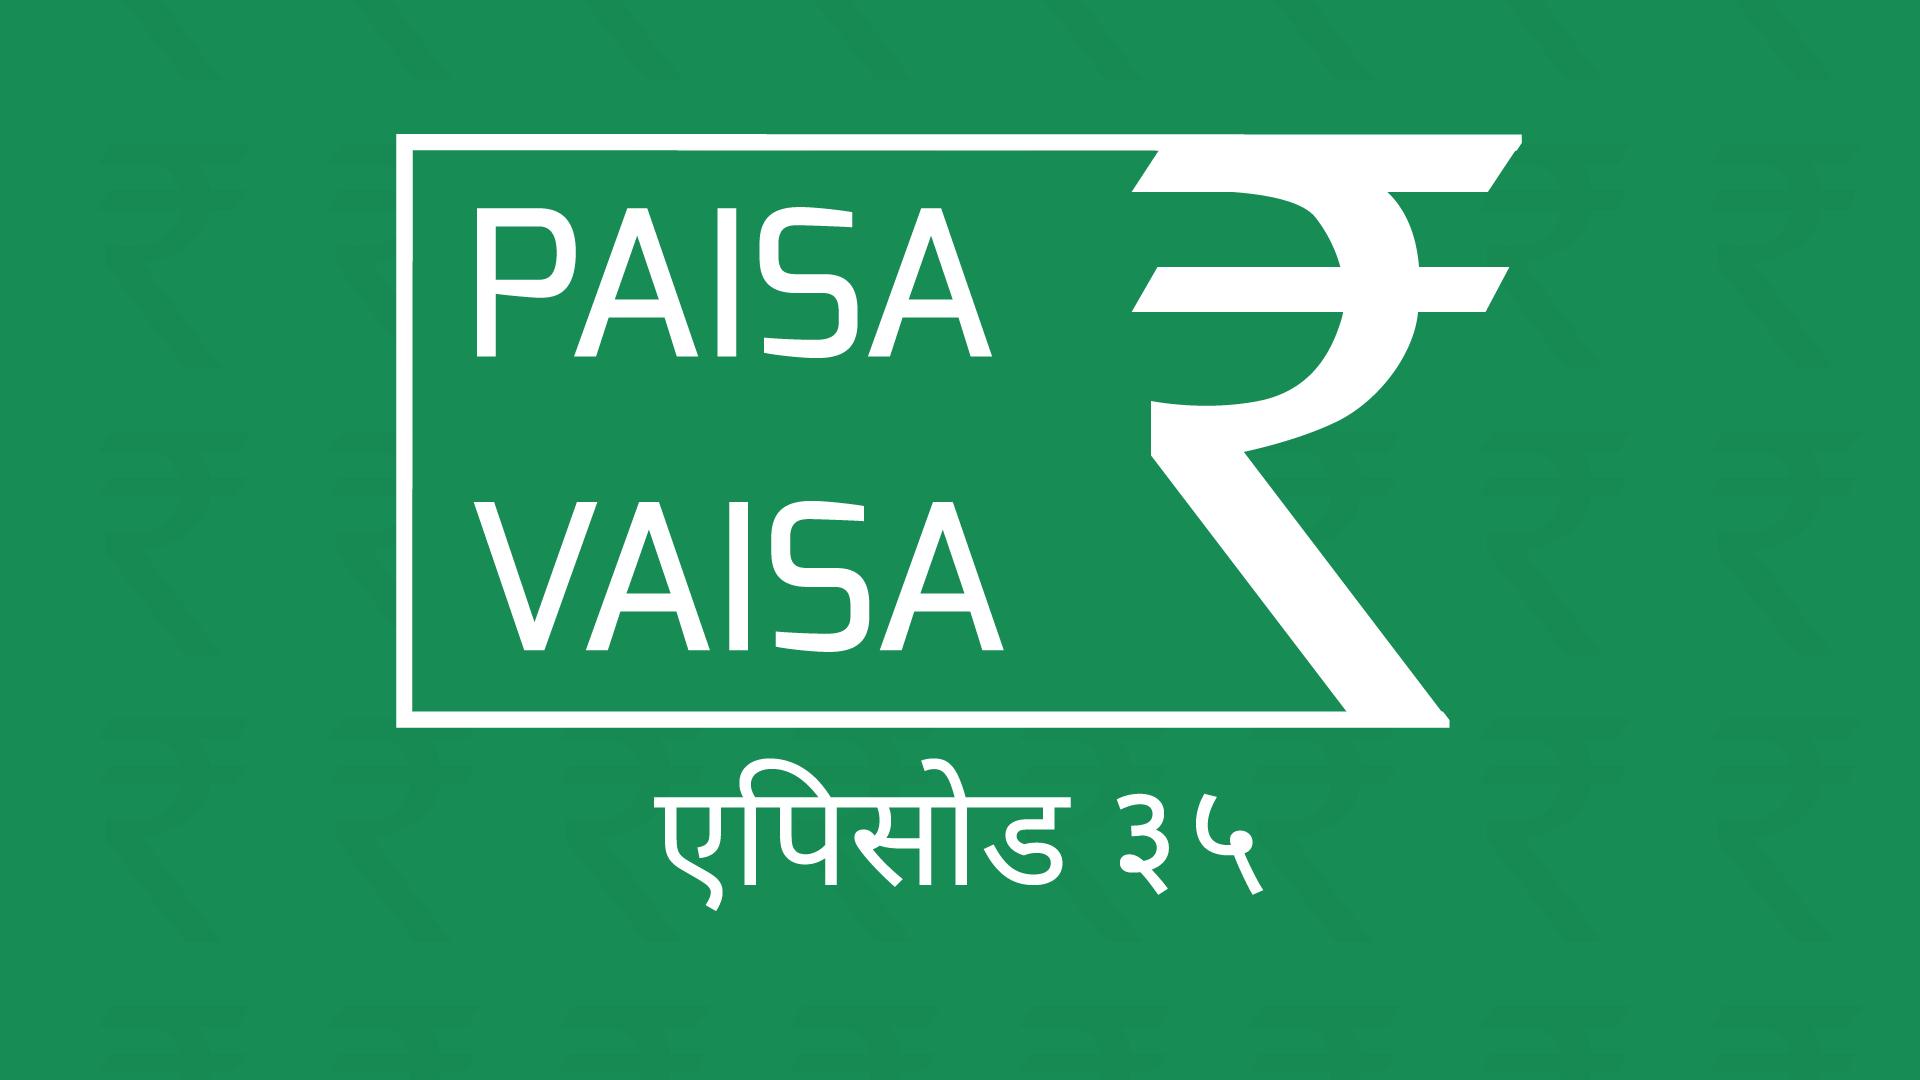 PaisaVaisaHindiEpisode35.png